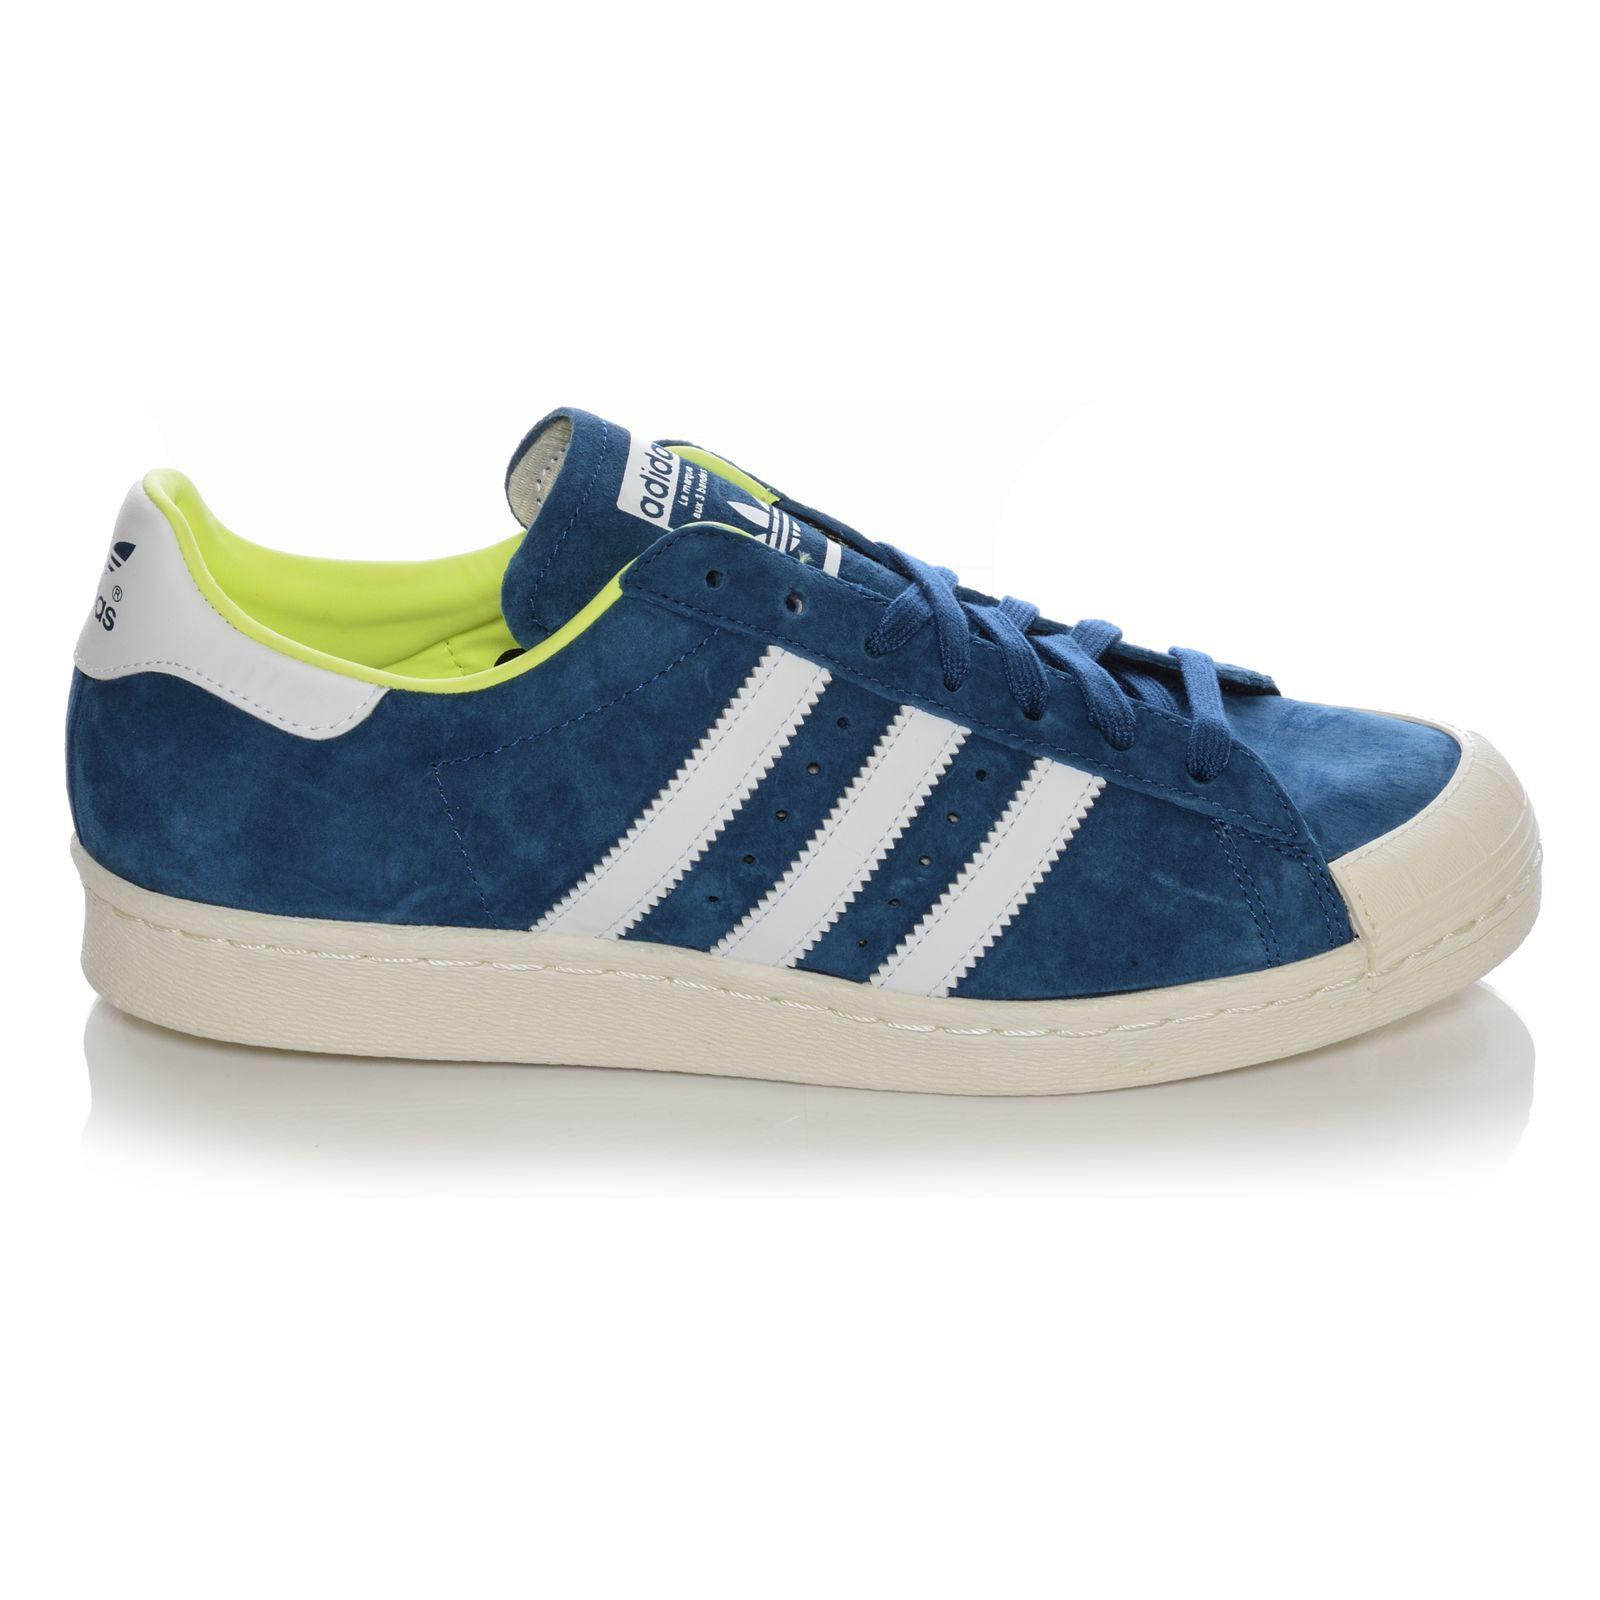 adidas originals superstar 80s halfshell shoes leather sneakers blue 36 2 3 ebay. Black Bedroom Furniture Sets. Home Design Ideas